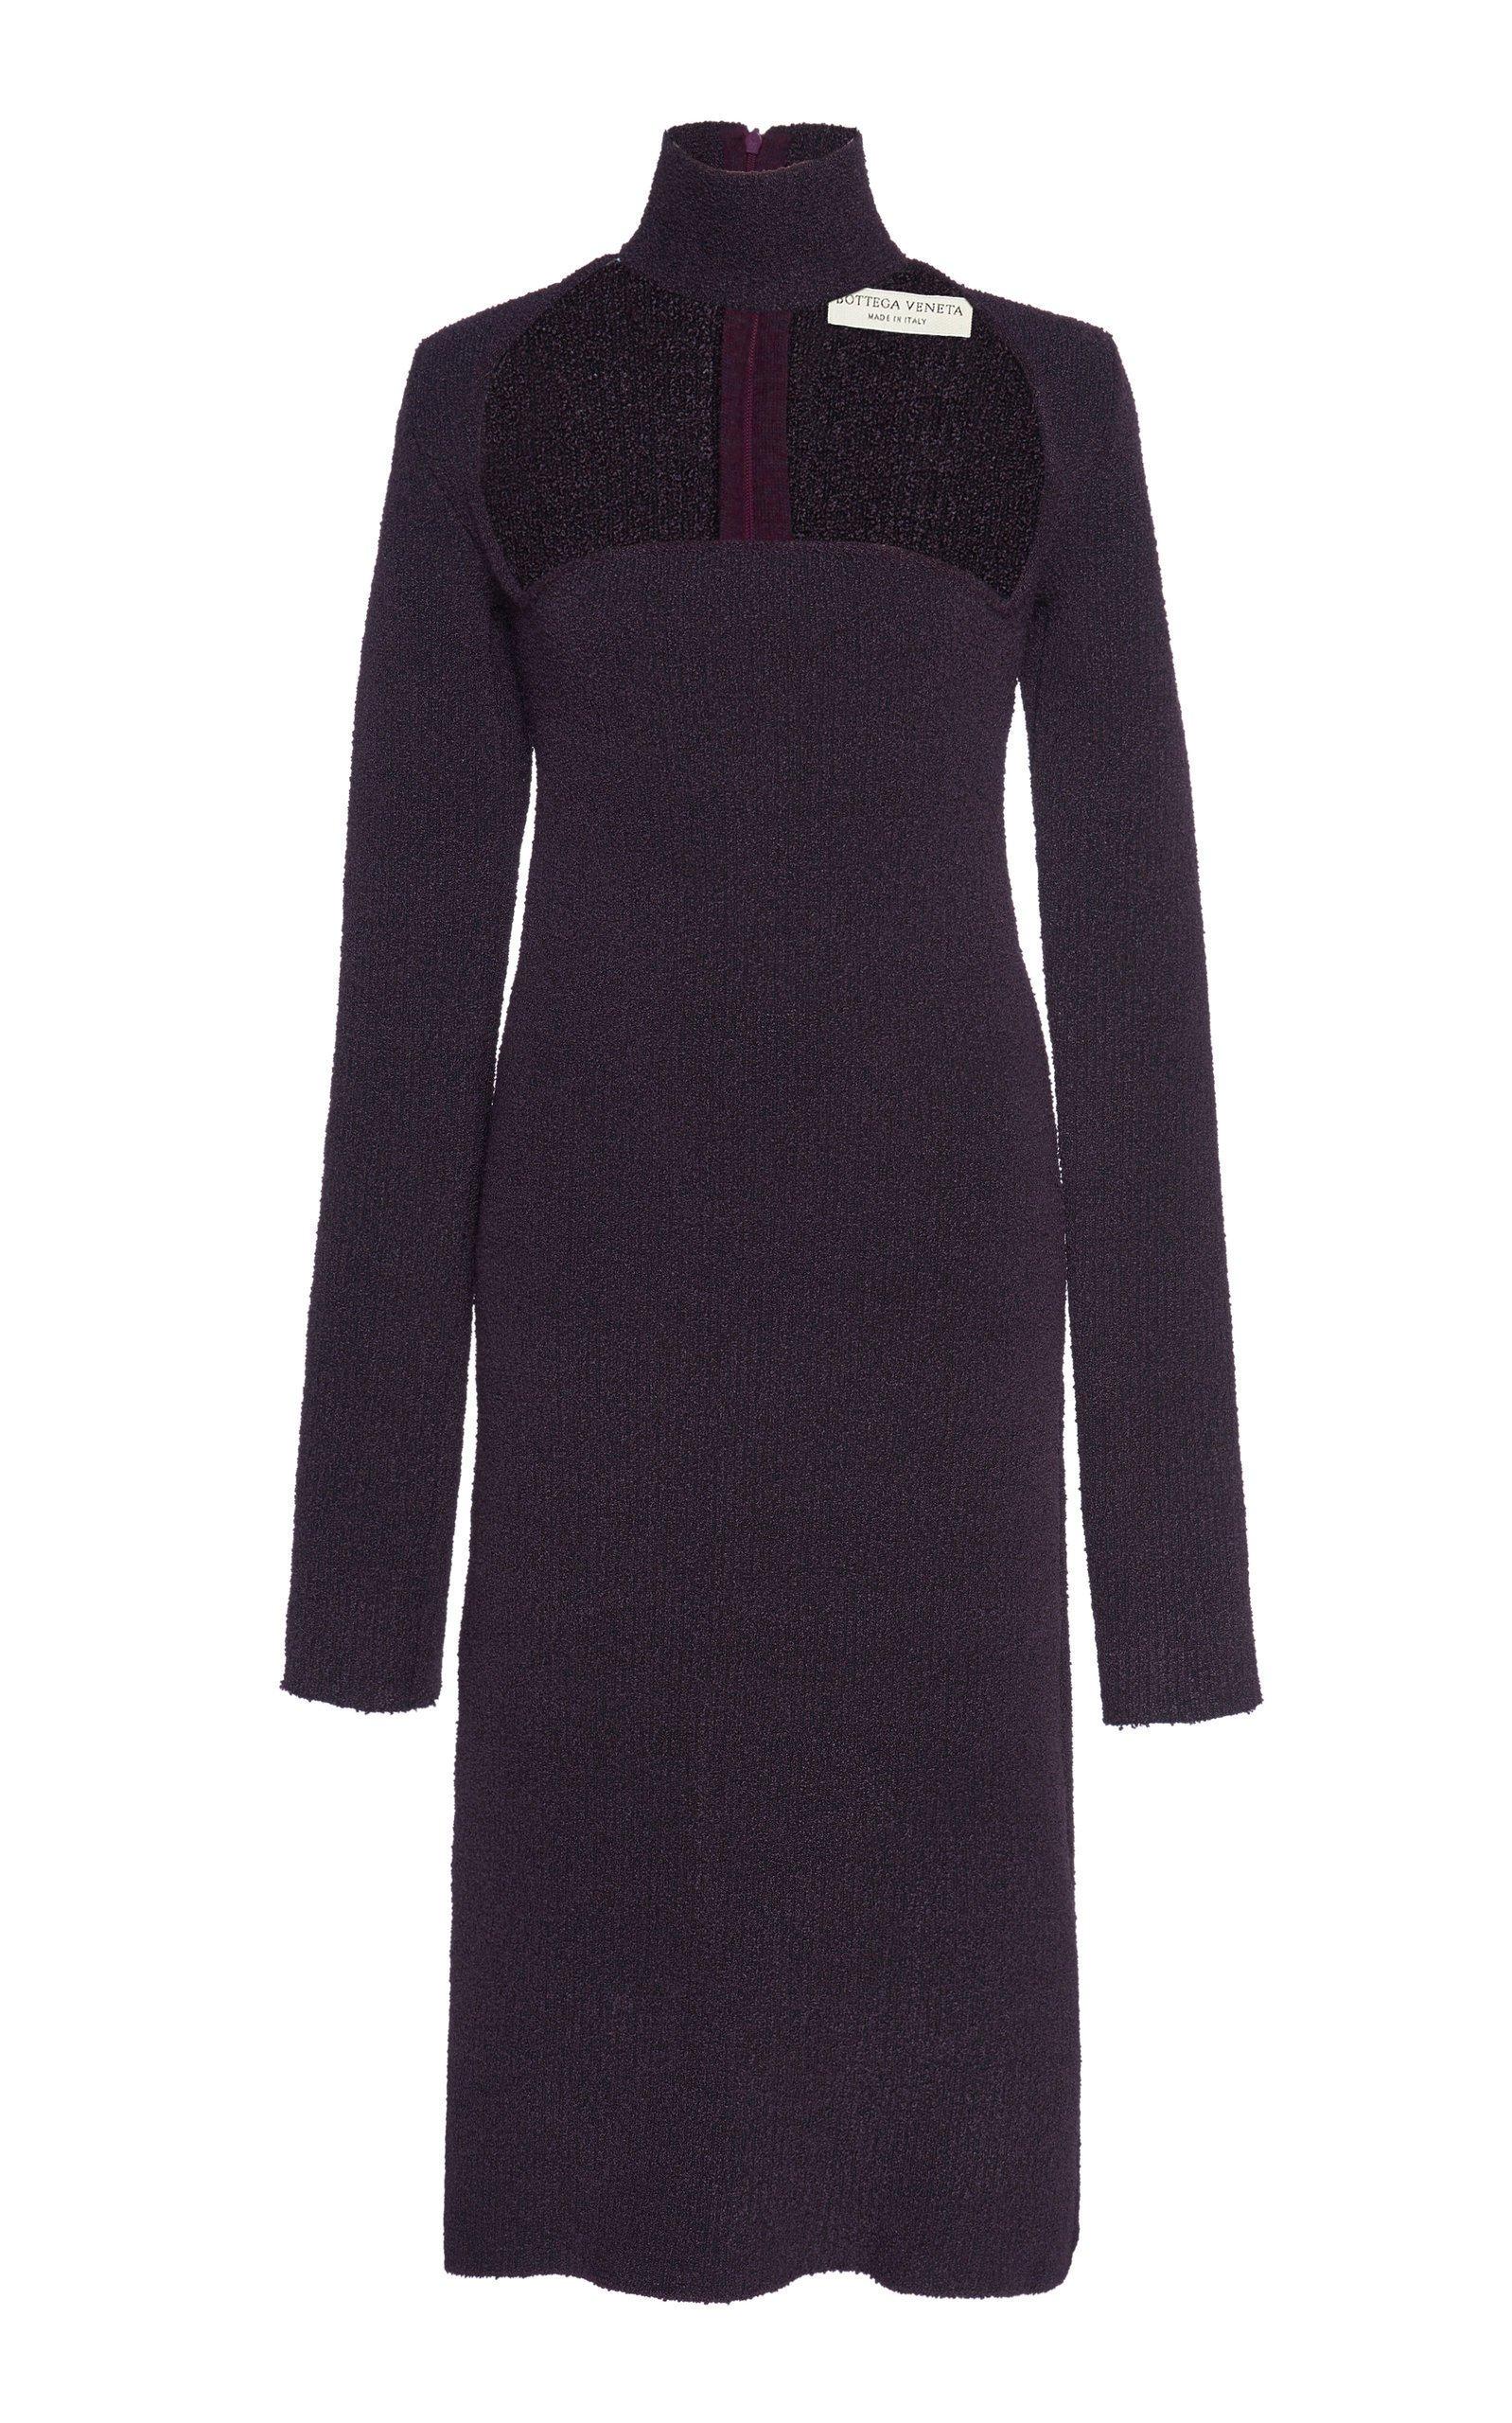 Bottega Veneta Cutout Turtleneck Stretch-Wool Crepe Midi Dress